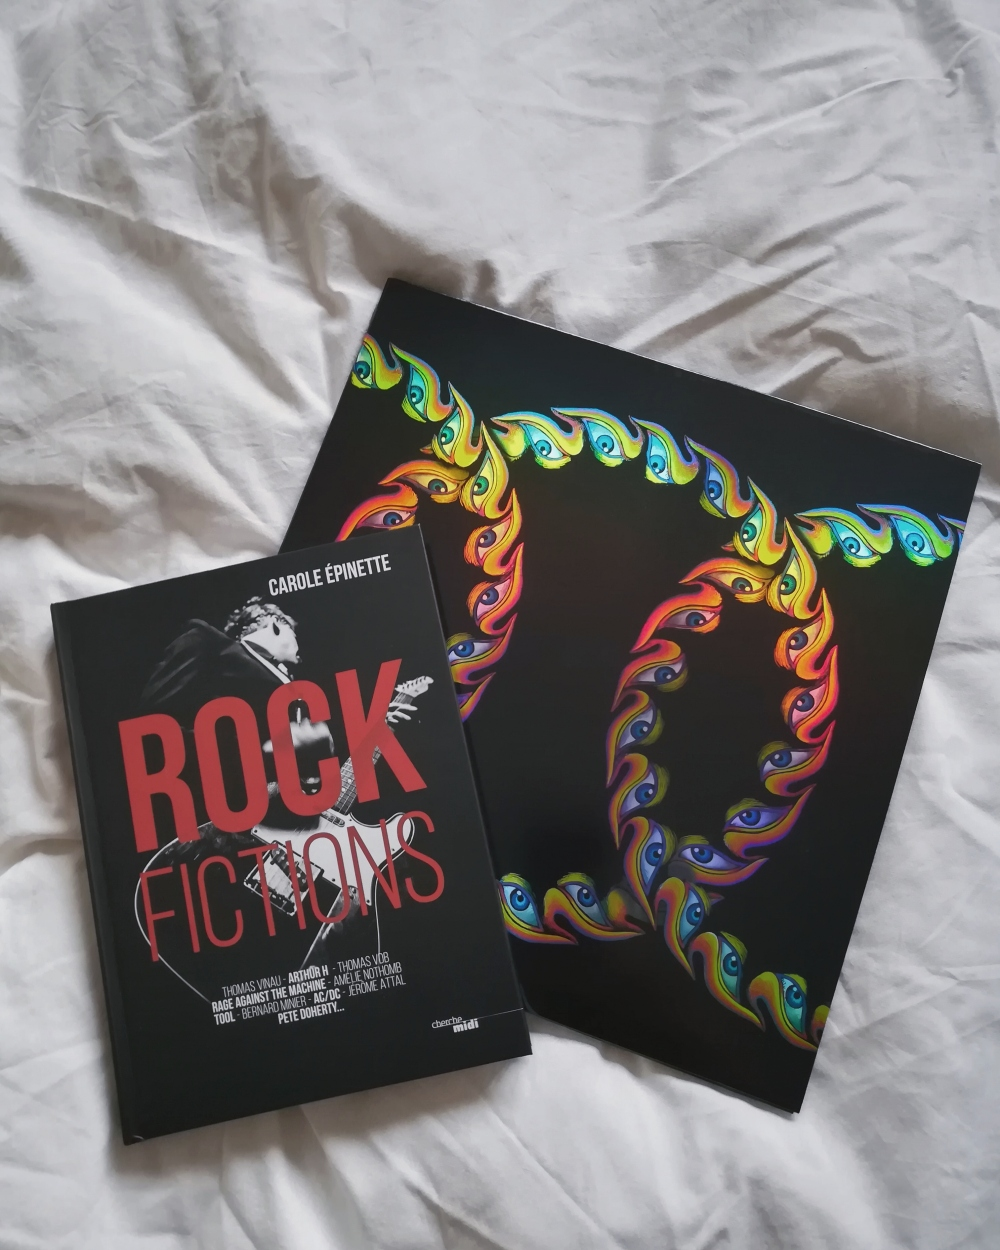 tomabooks-rock-fictions-carole-epinette